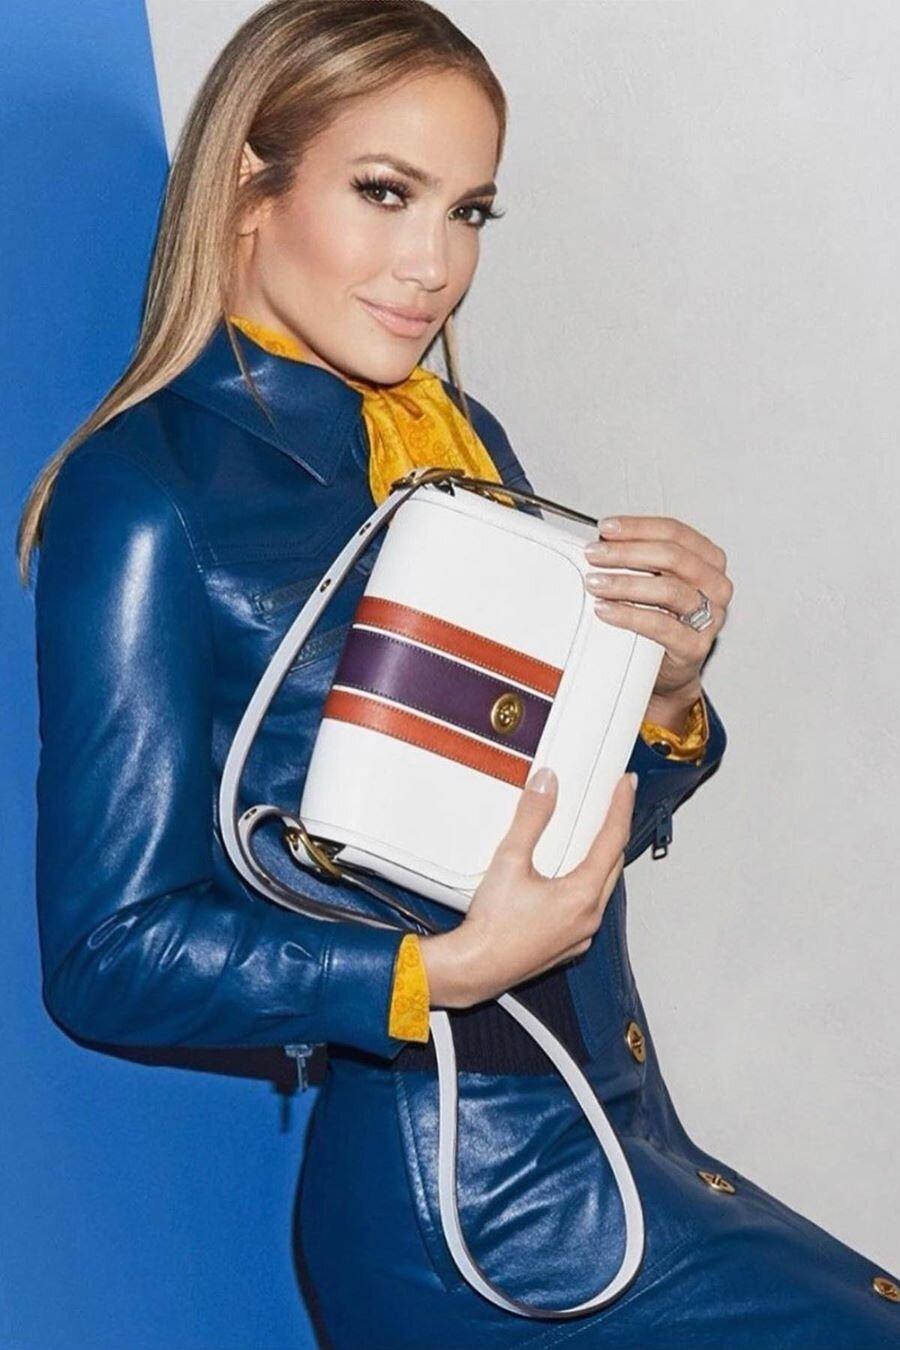 jennifer-lopez-coach-blue-leather-jacket.jpg